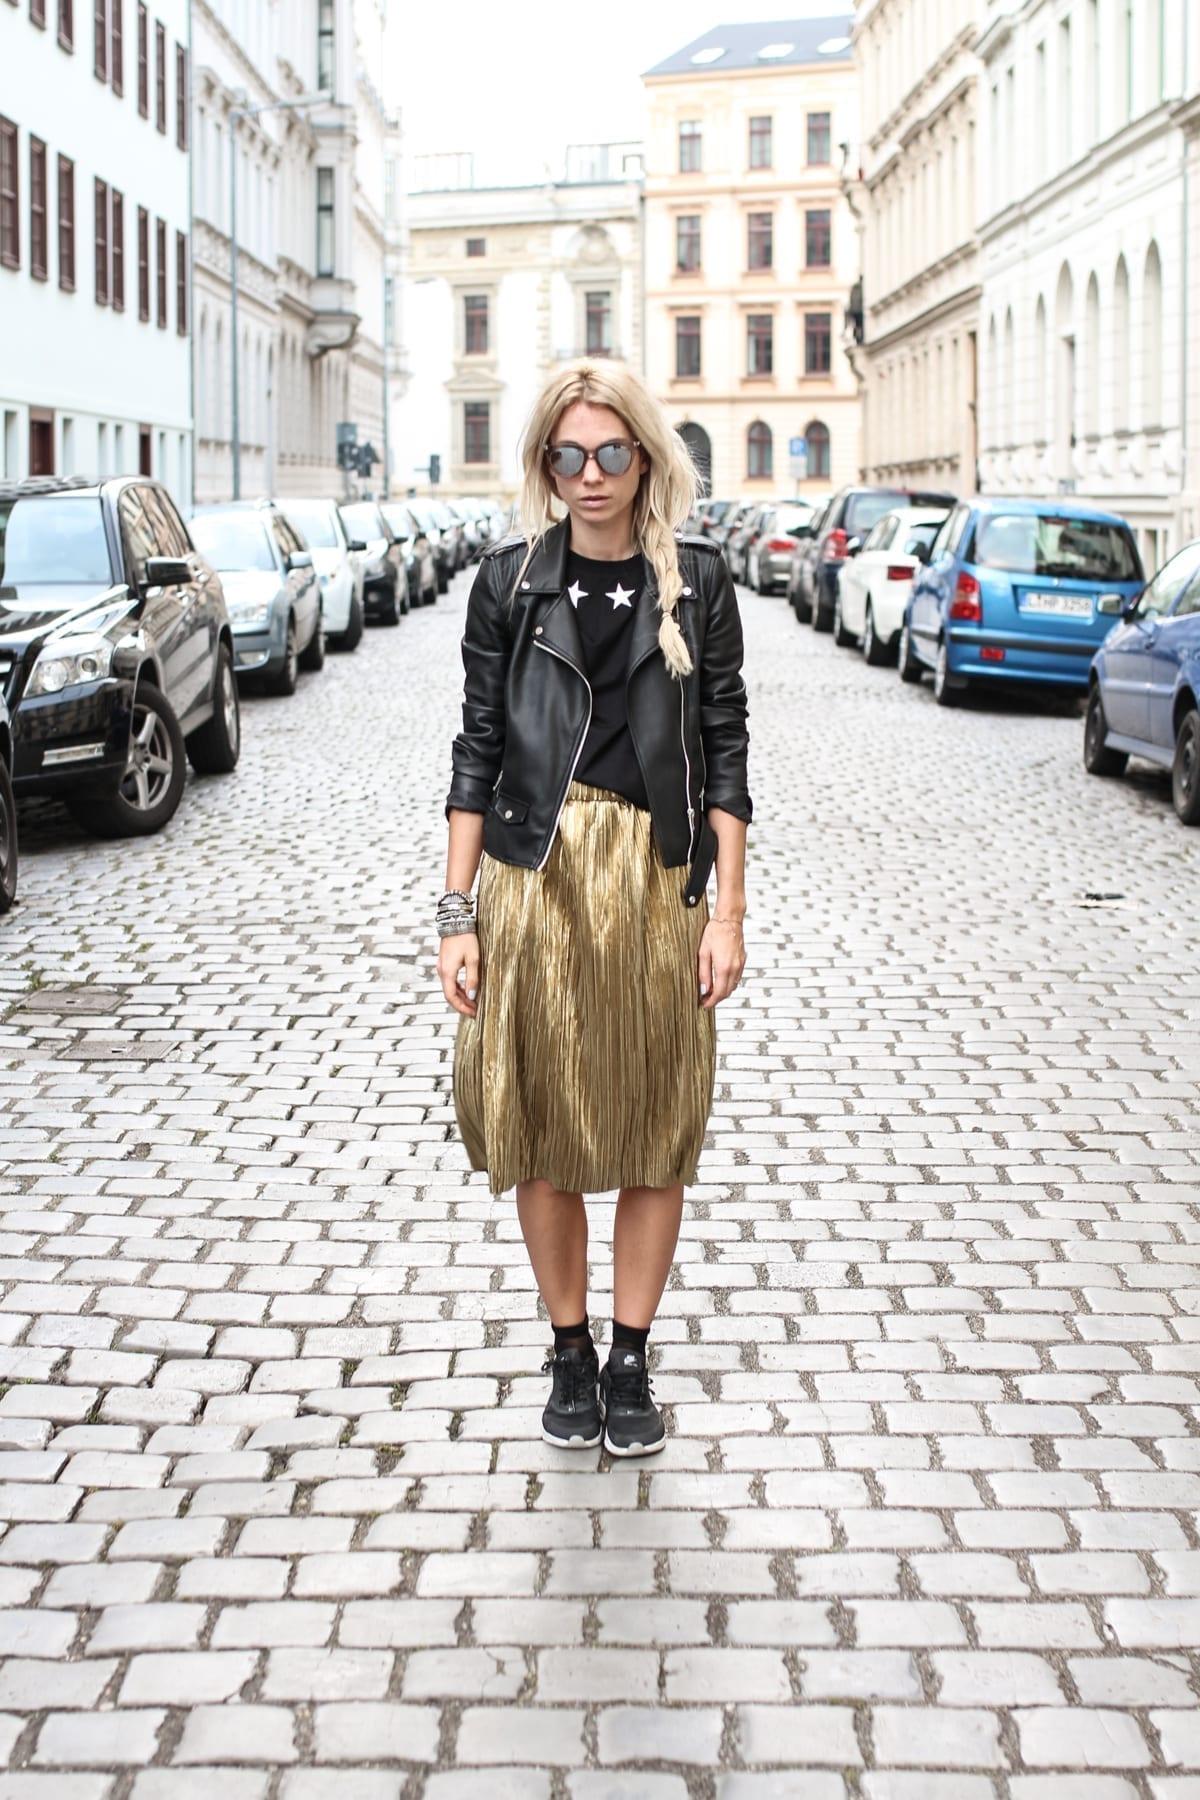 CK_1603_Metalic-Street-Style-Fashion_-9484